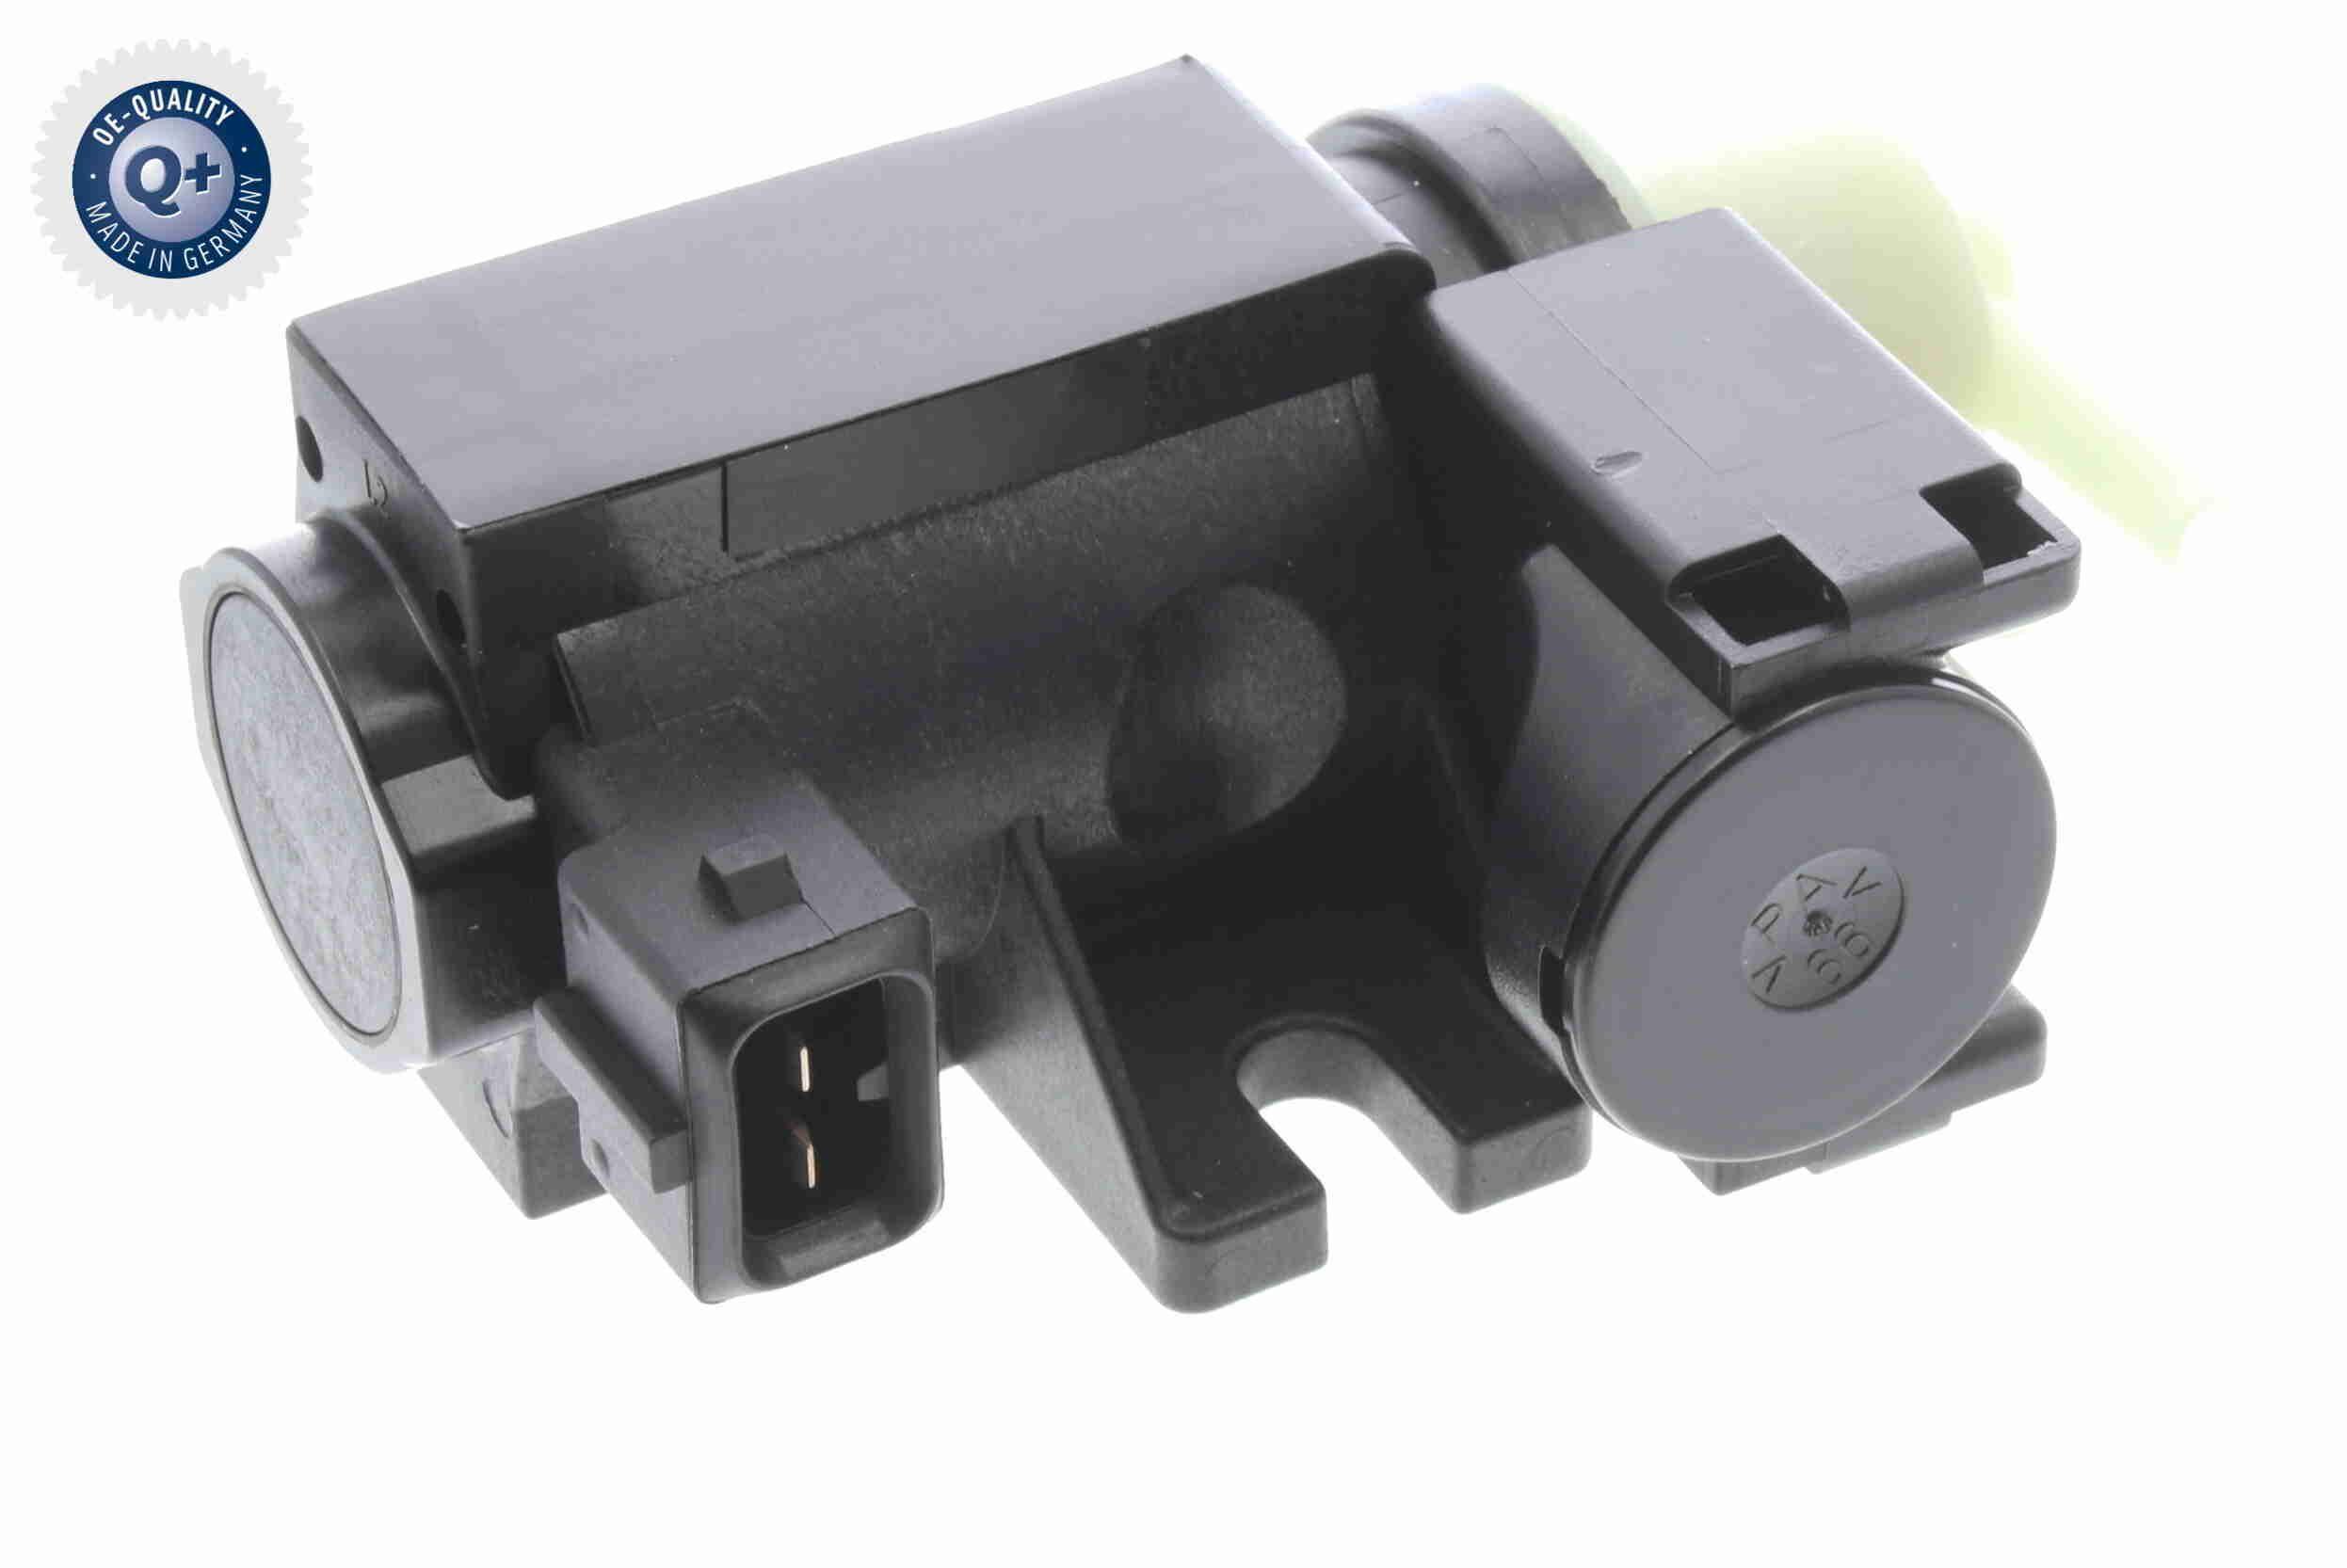 VEMO Druckwandler, Turbolader V20-63-0010